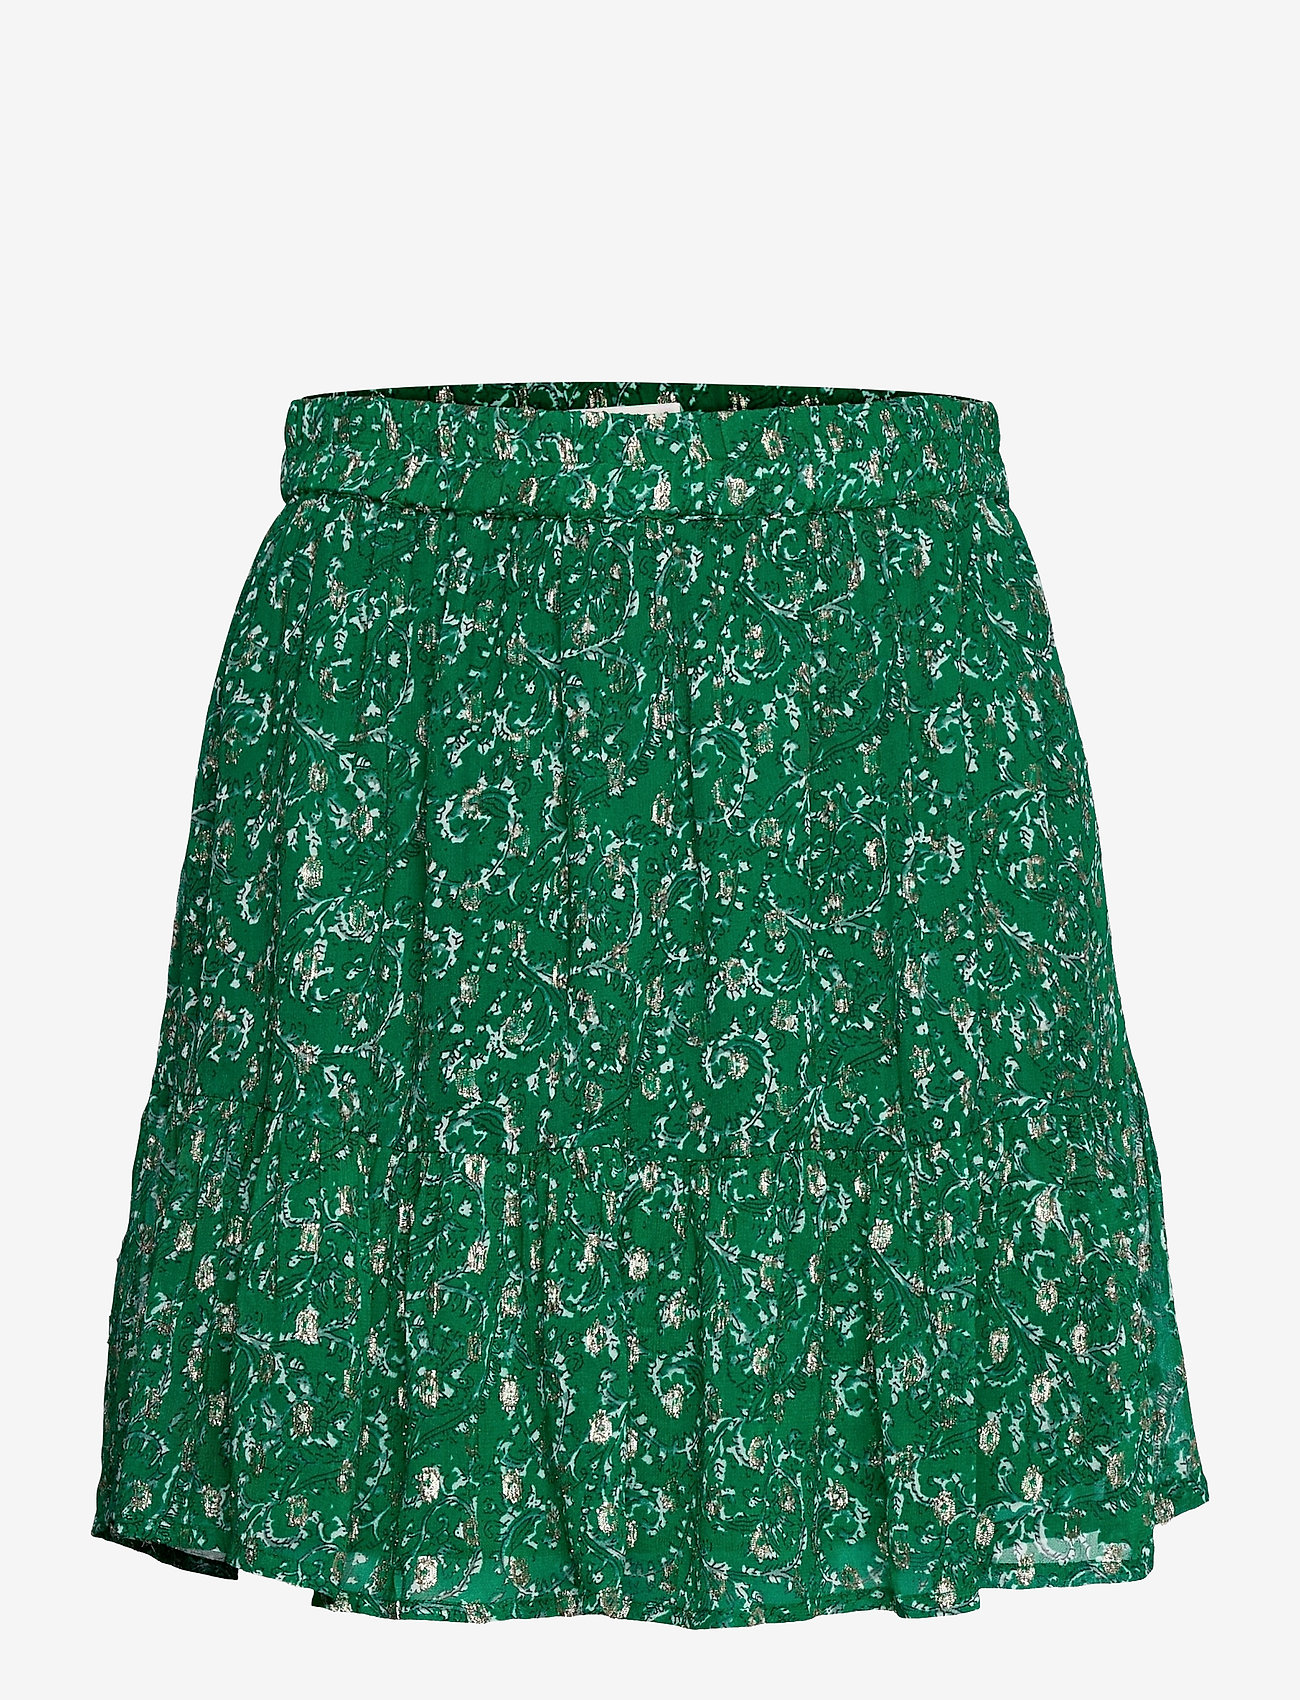 Lollys Laundry - Alexa Skirt - dark green - 0